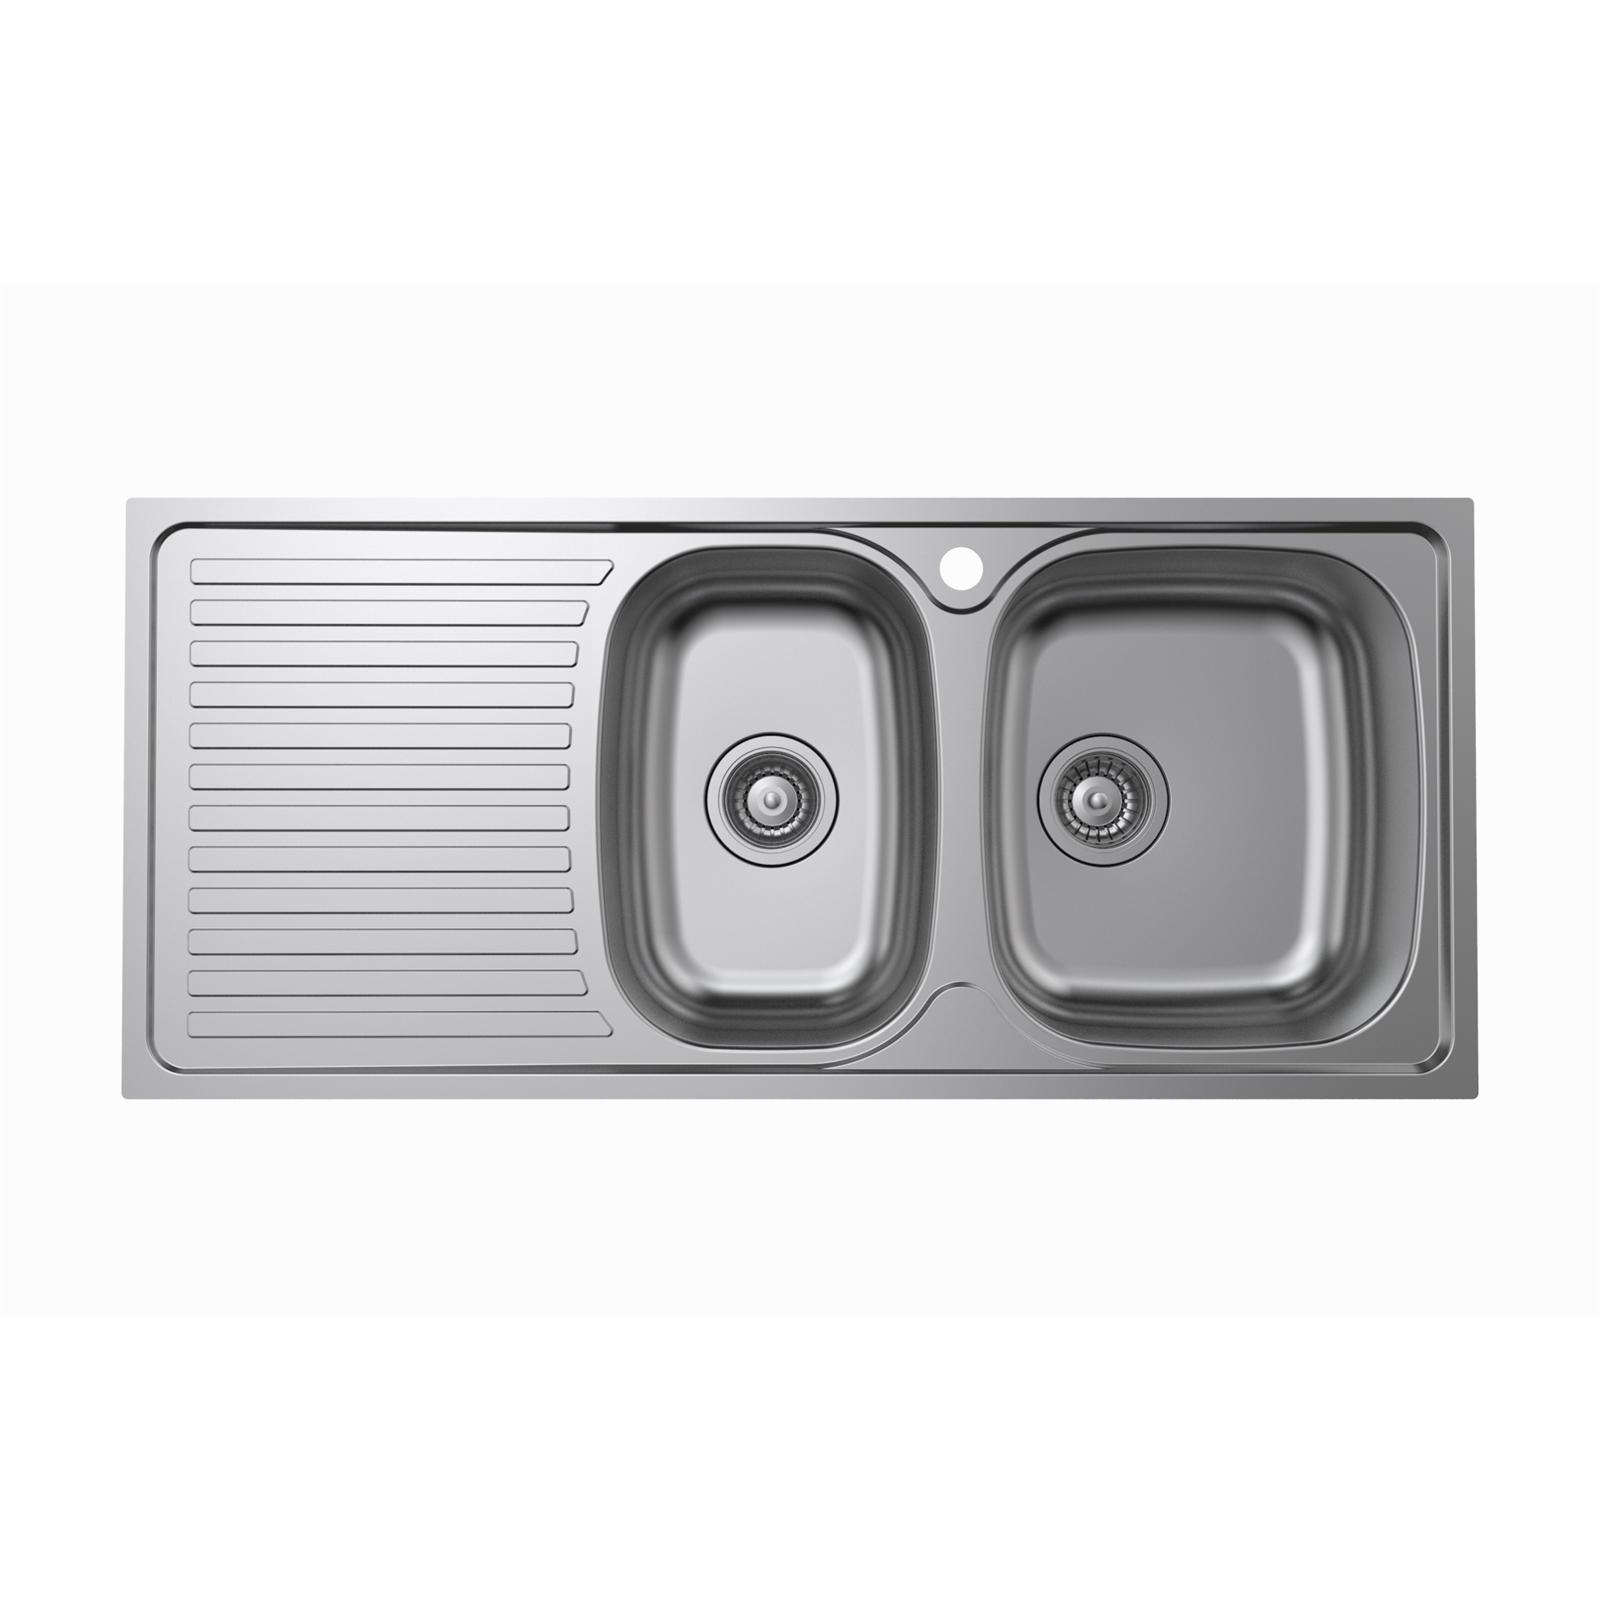 Kinetic 1080 x 480 x 150mm 1 3/4 RH Bowl Sink